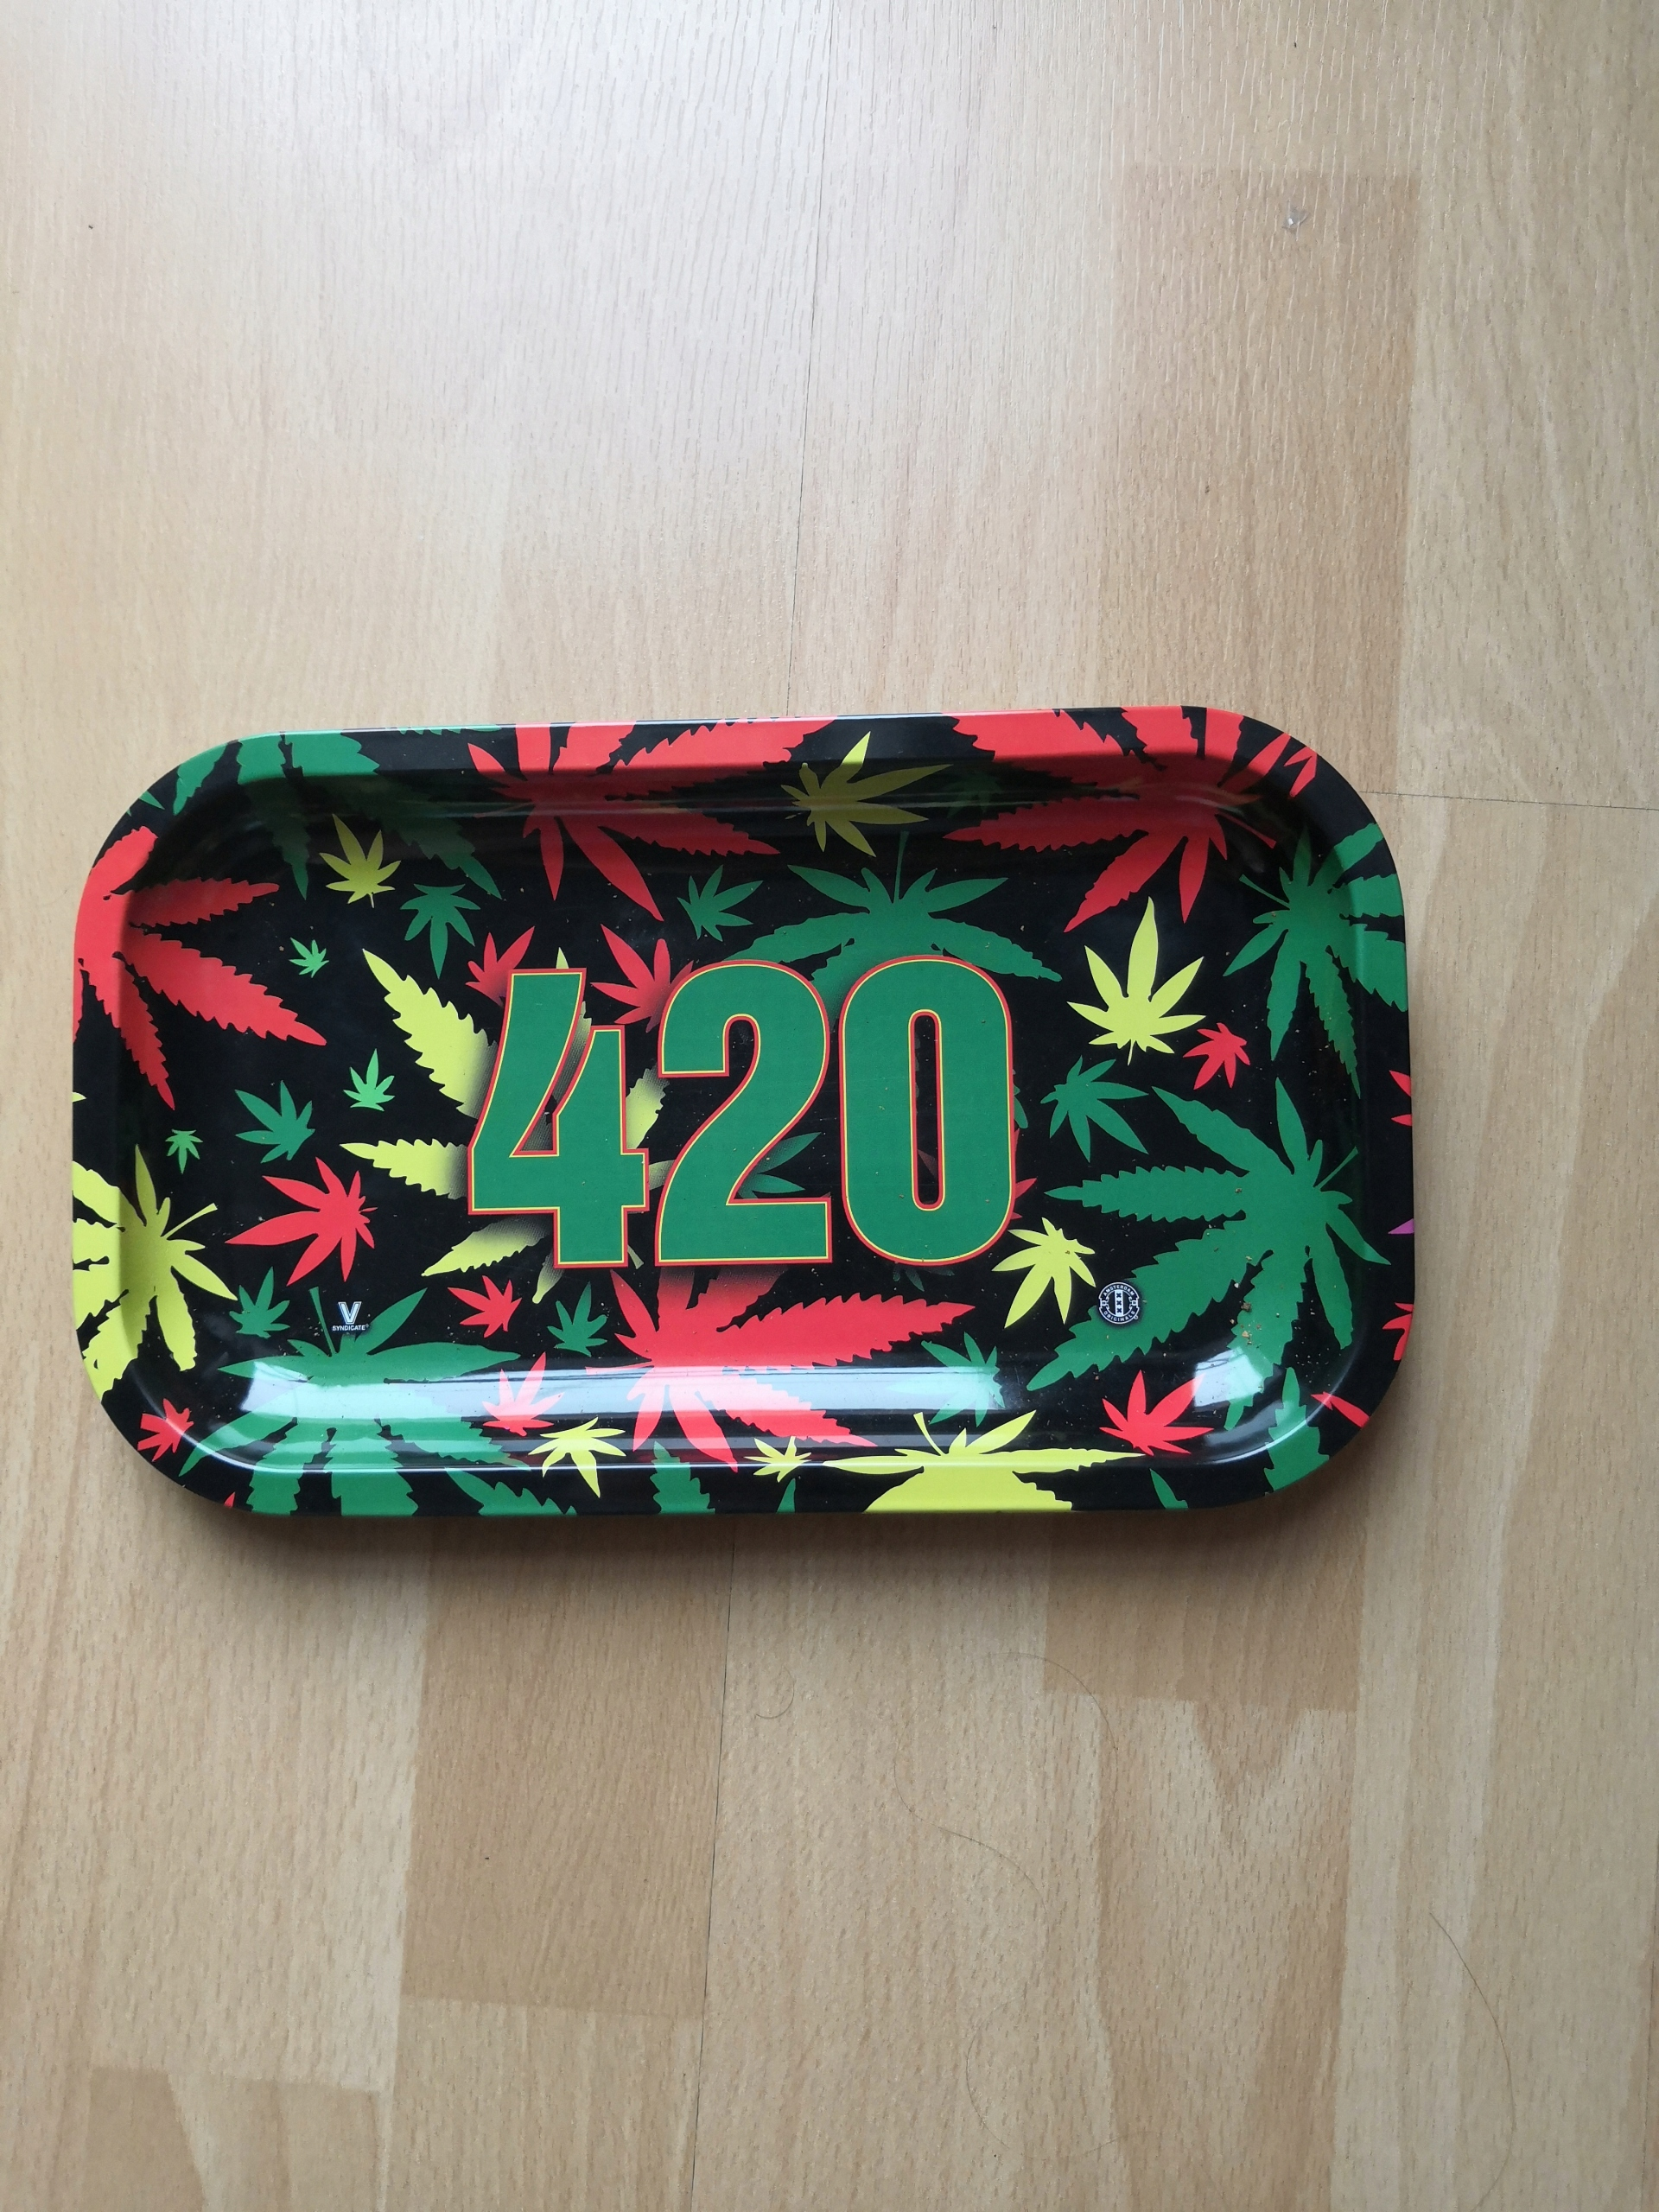 Tacka do kręcenia 420